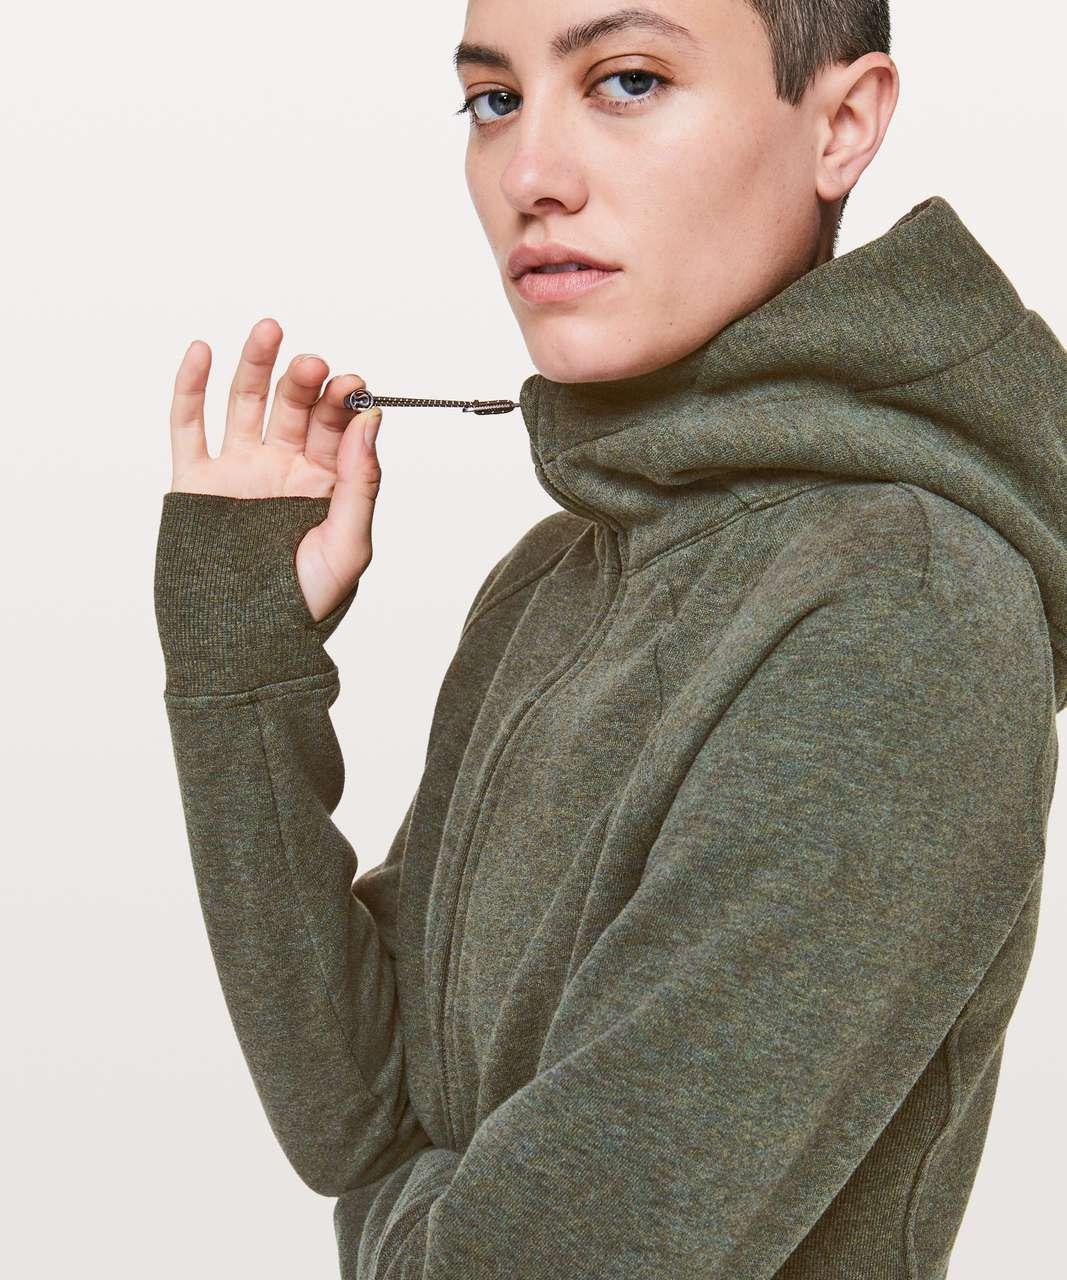 Lululemon Scuba Hoodie *Light Cotton Fleece - Heathered Camo Green